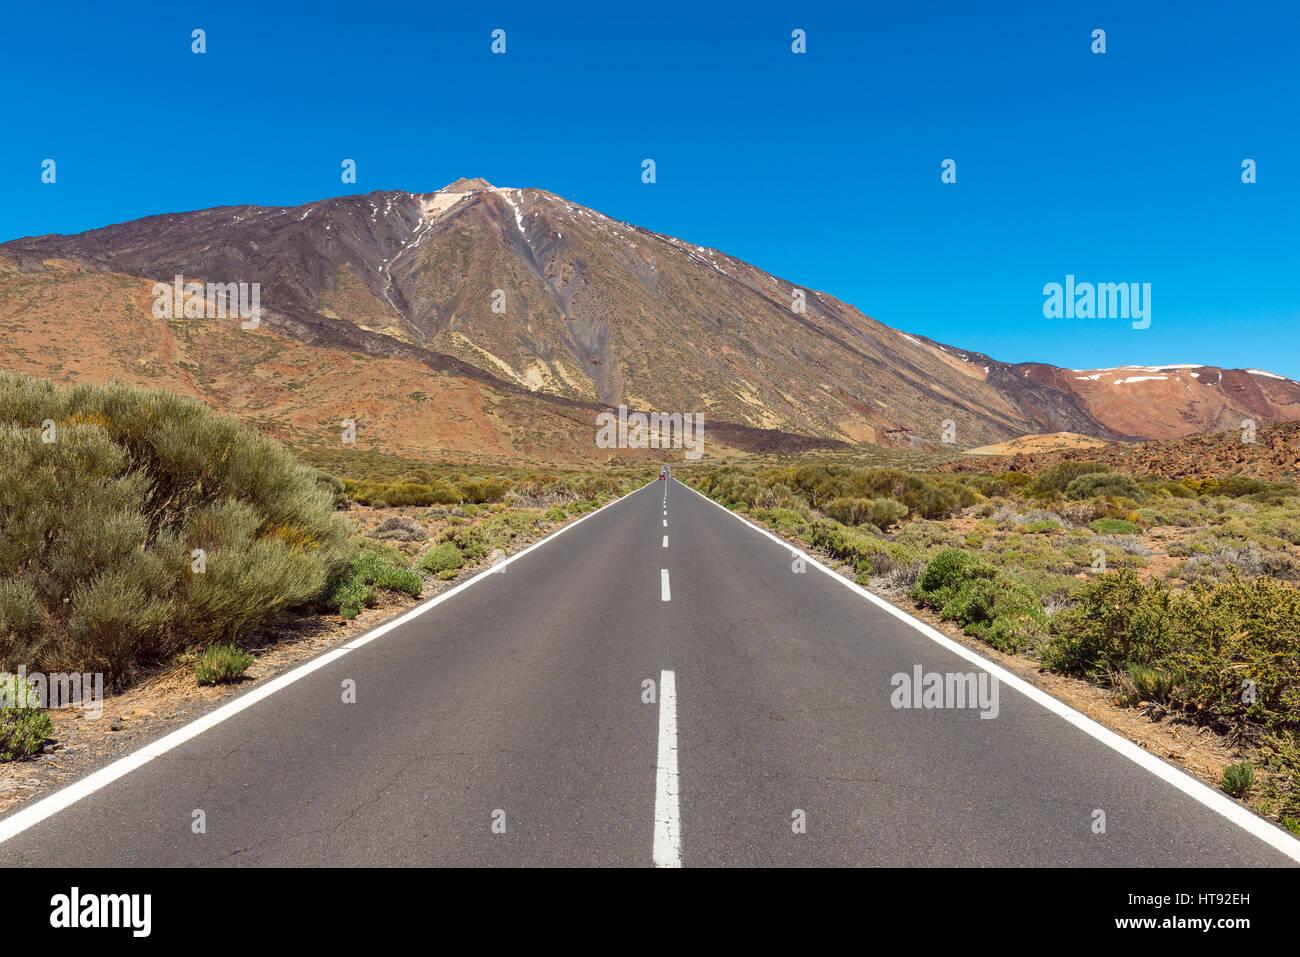 Straße mit Berg Pico del Teide, Parque Nacional del Teide, Teneriffa, Kanarische Inseln, Spanien Stockbild